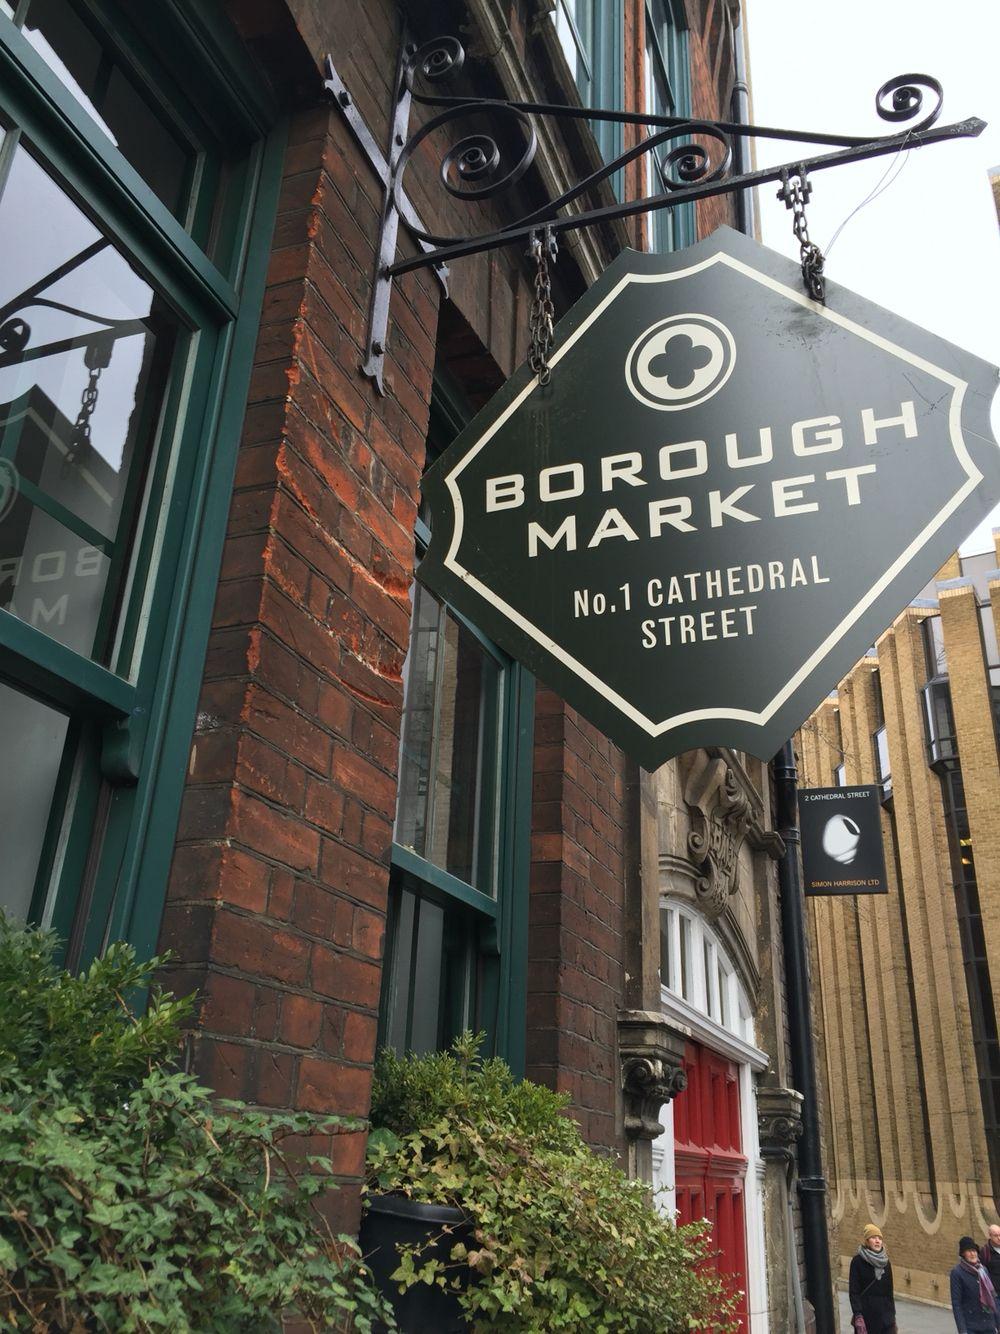 Borough market #london